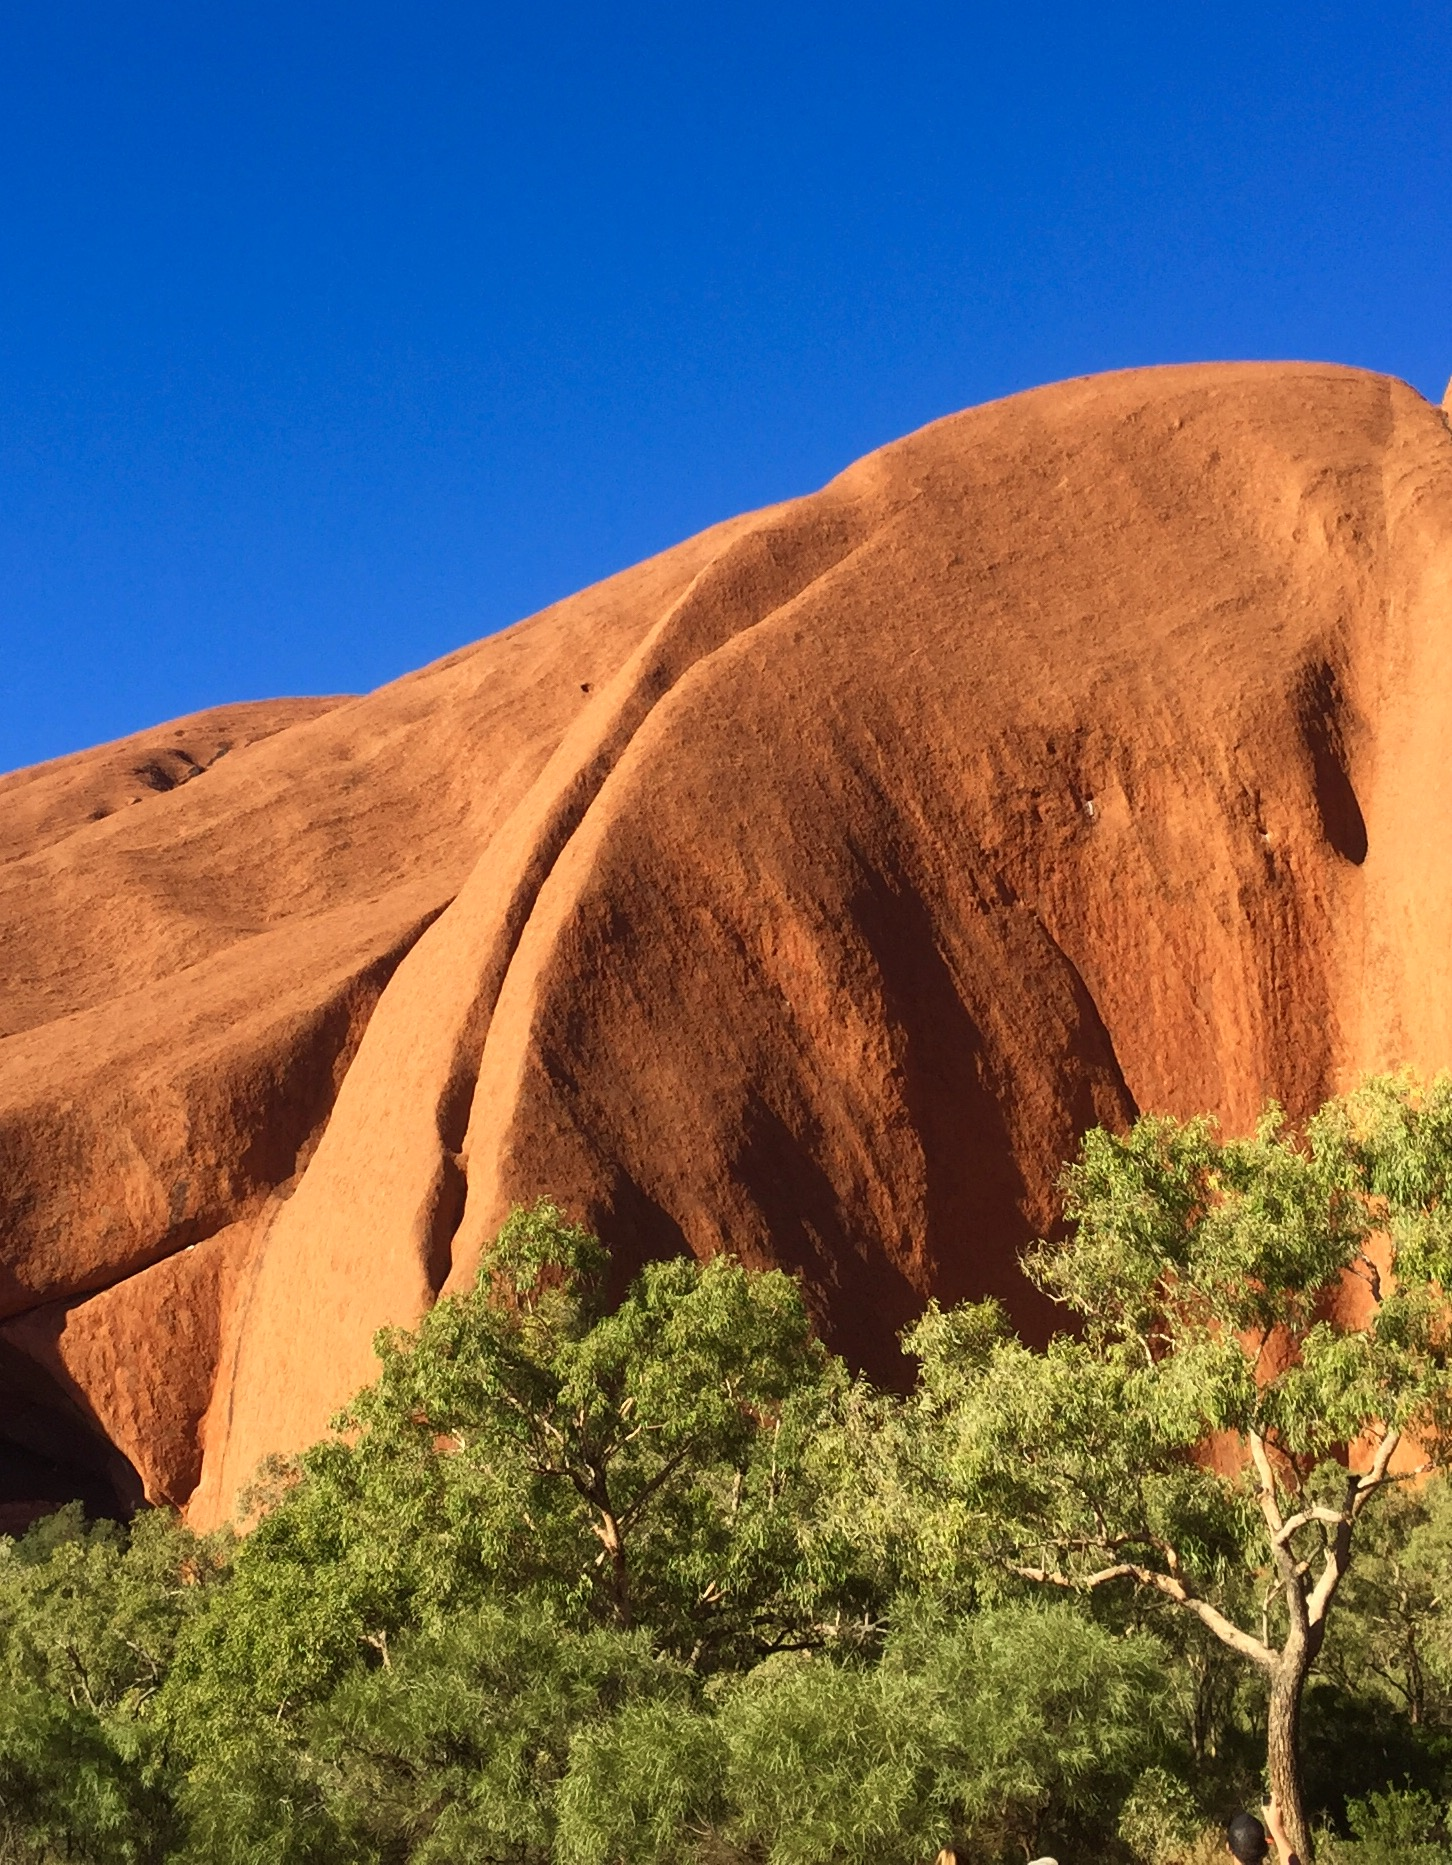 Vue rapprochée d'Uluru au cœur de l'Australie centrale. © photo : Aboriginal Signature • Estrangin Fine Art Gallery